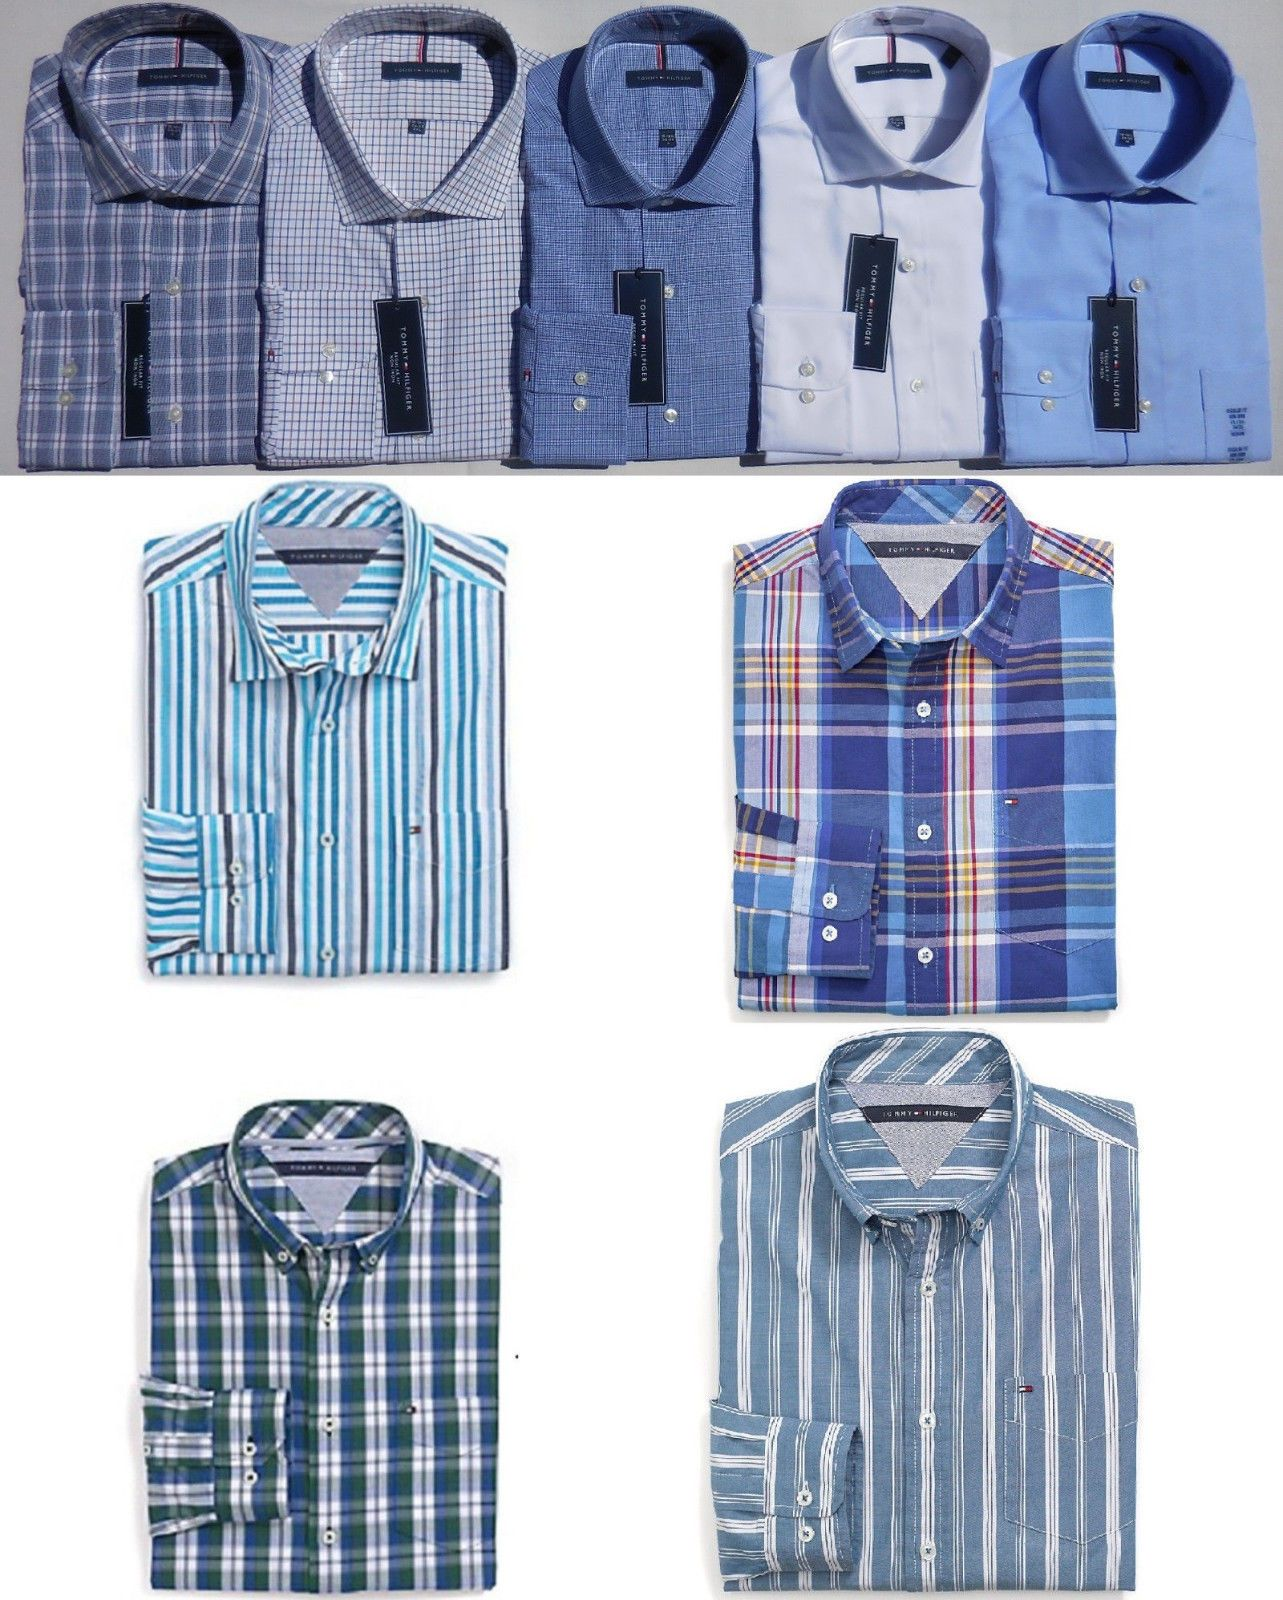 TOMMY HILFIGER MEN PLAID SHIRT ALL SIZES NWT white blue 100/% cotton chest pocket